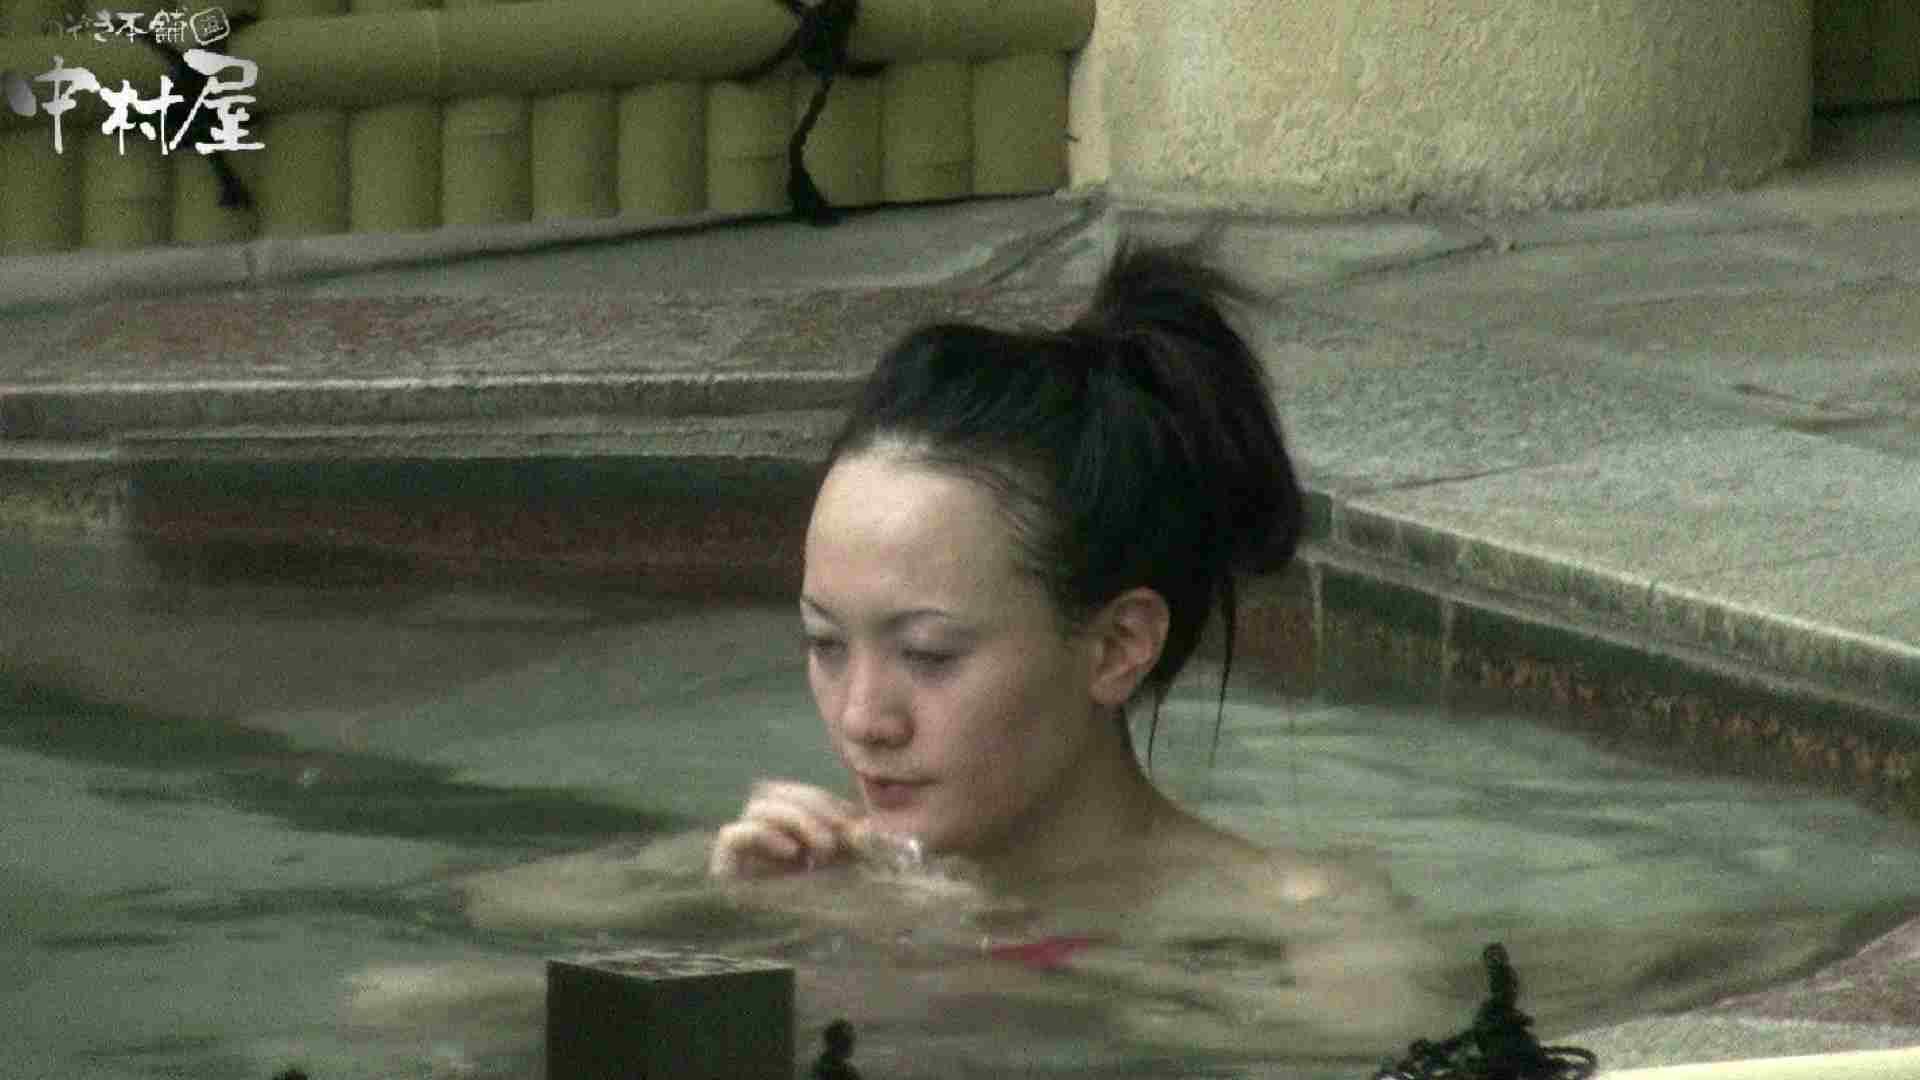 Aquaな露天風呂Vol.903 露天風呂編 | 盗撮シリーズ  81PIX 19